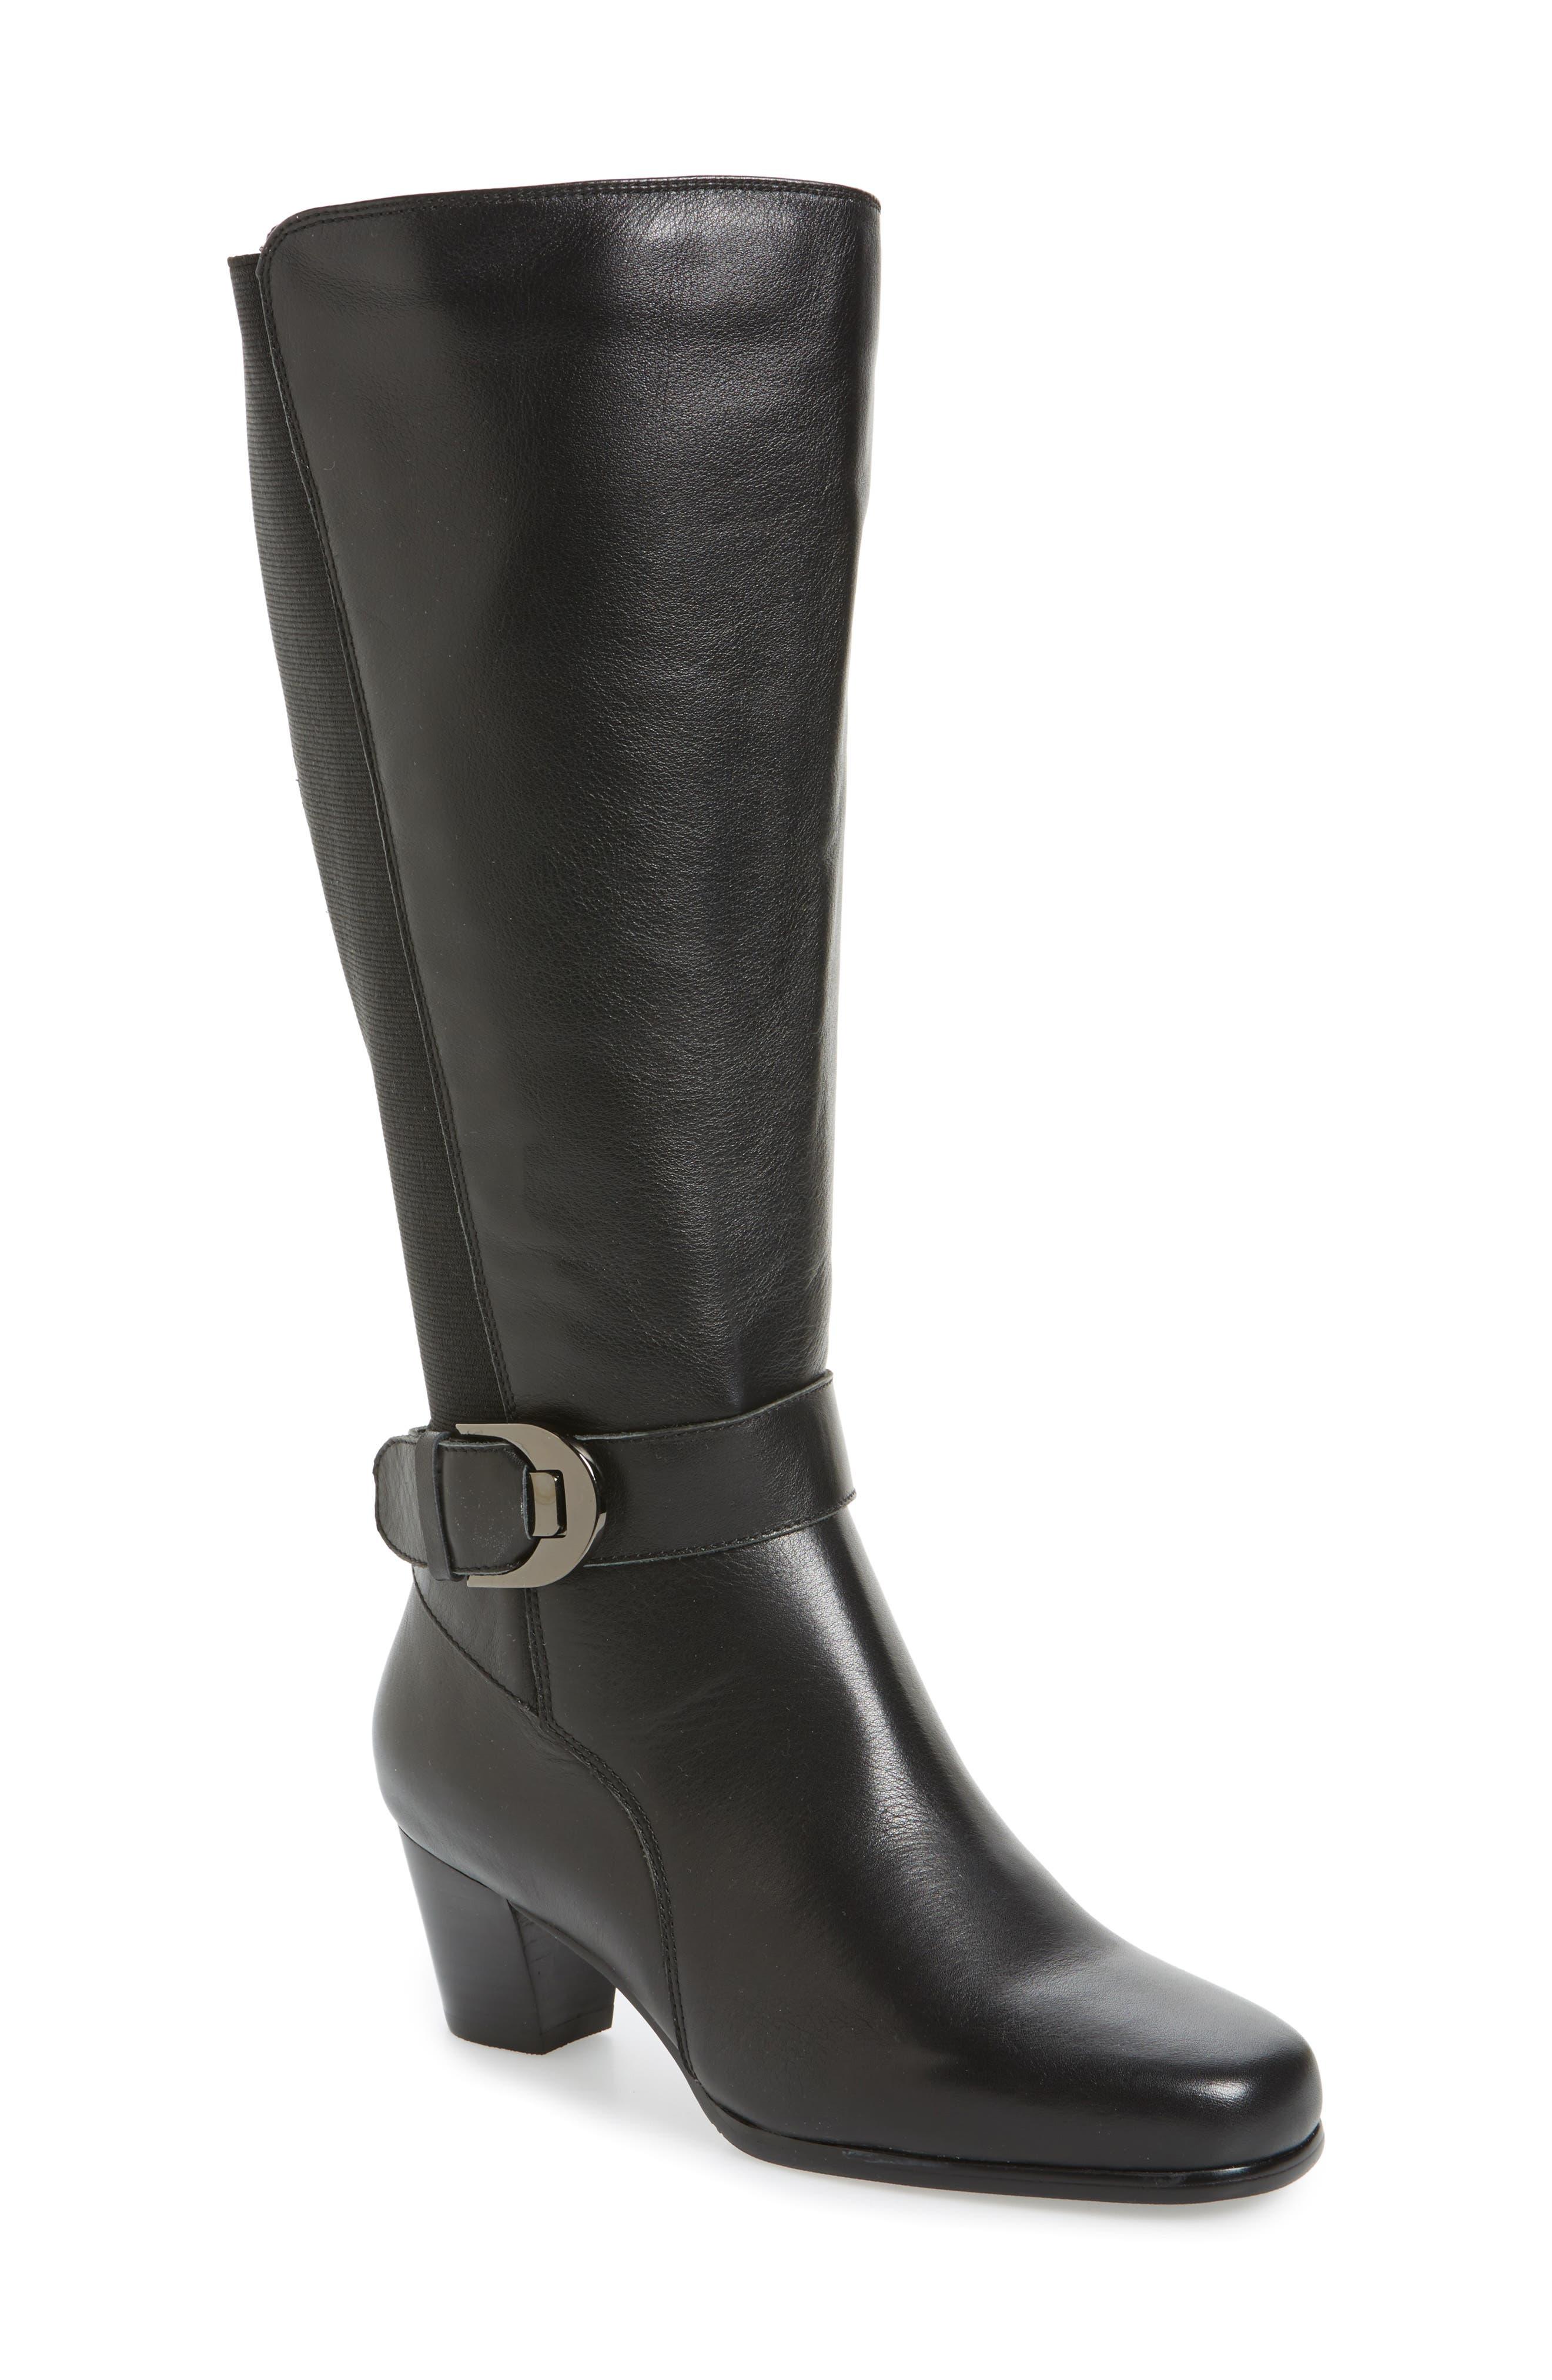 Bonita 18 Boot,                         Main,                         color, Black Leather Fabric